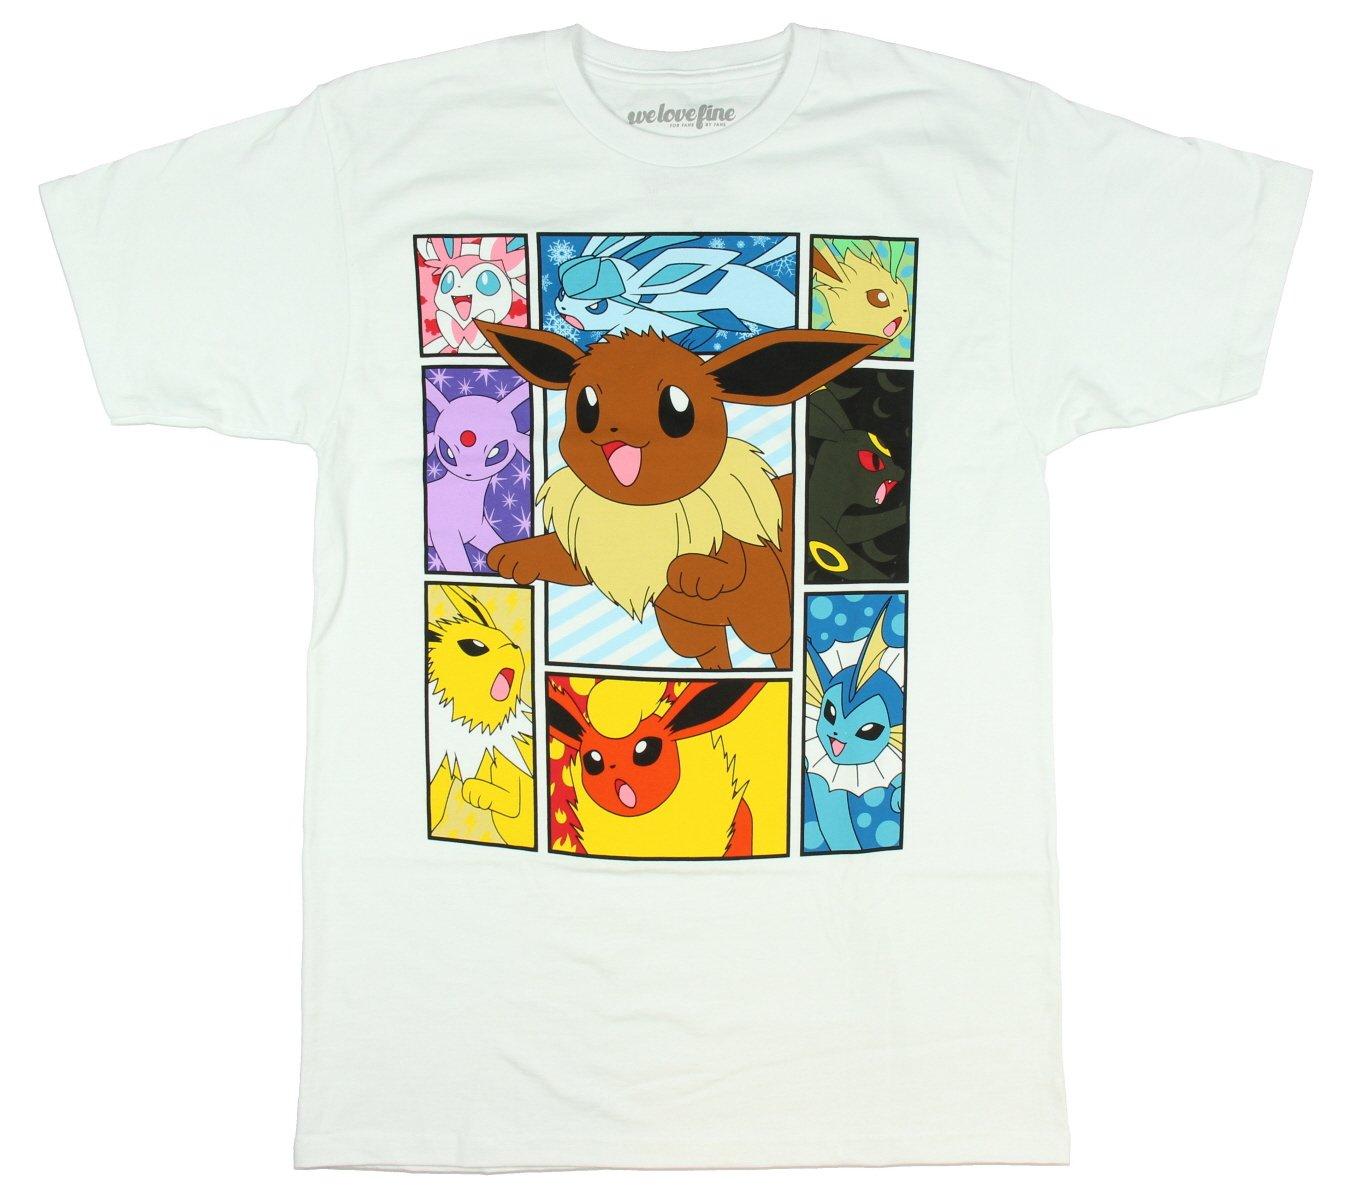 Pokemon Elements Of Eevee T-shirt (Large,White)